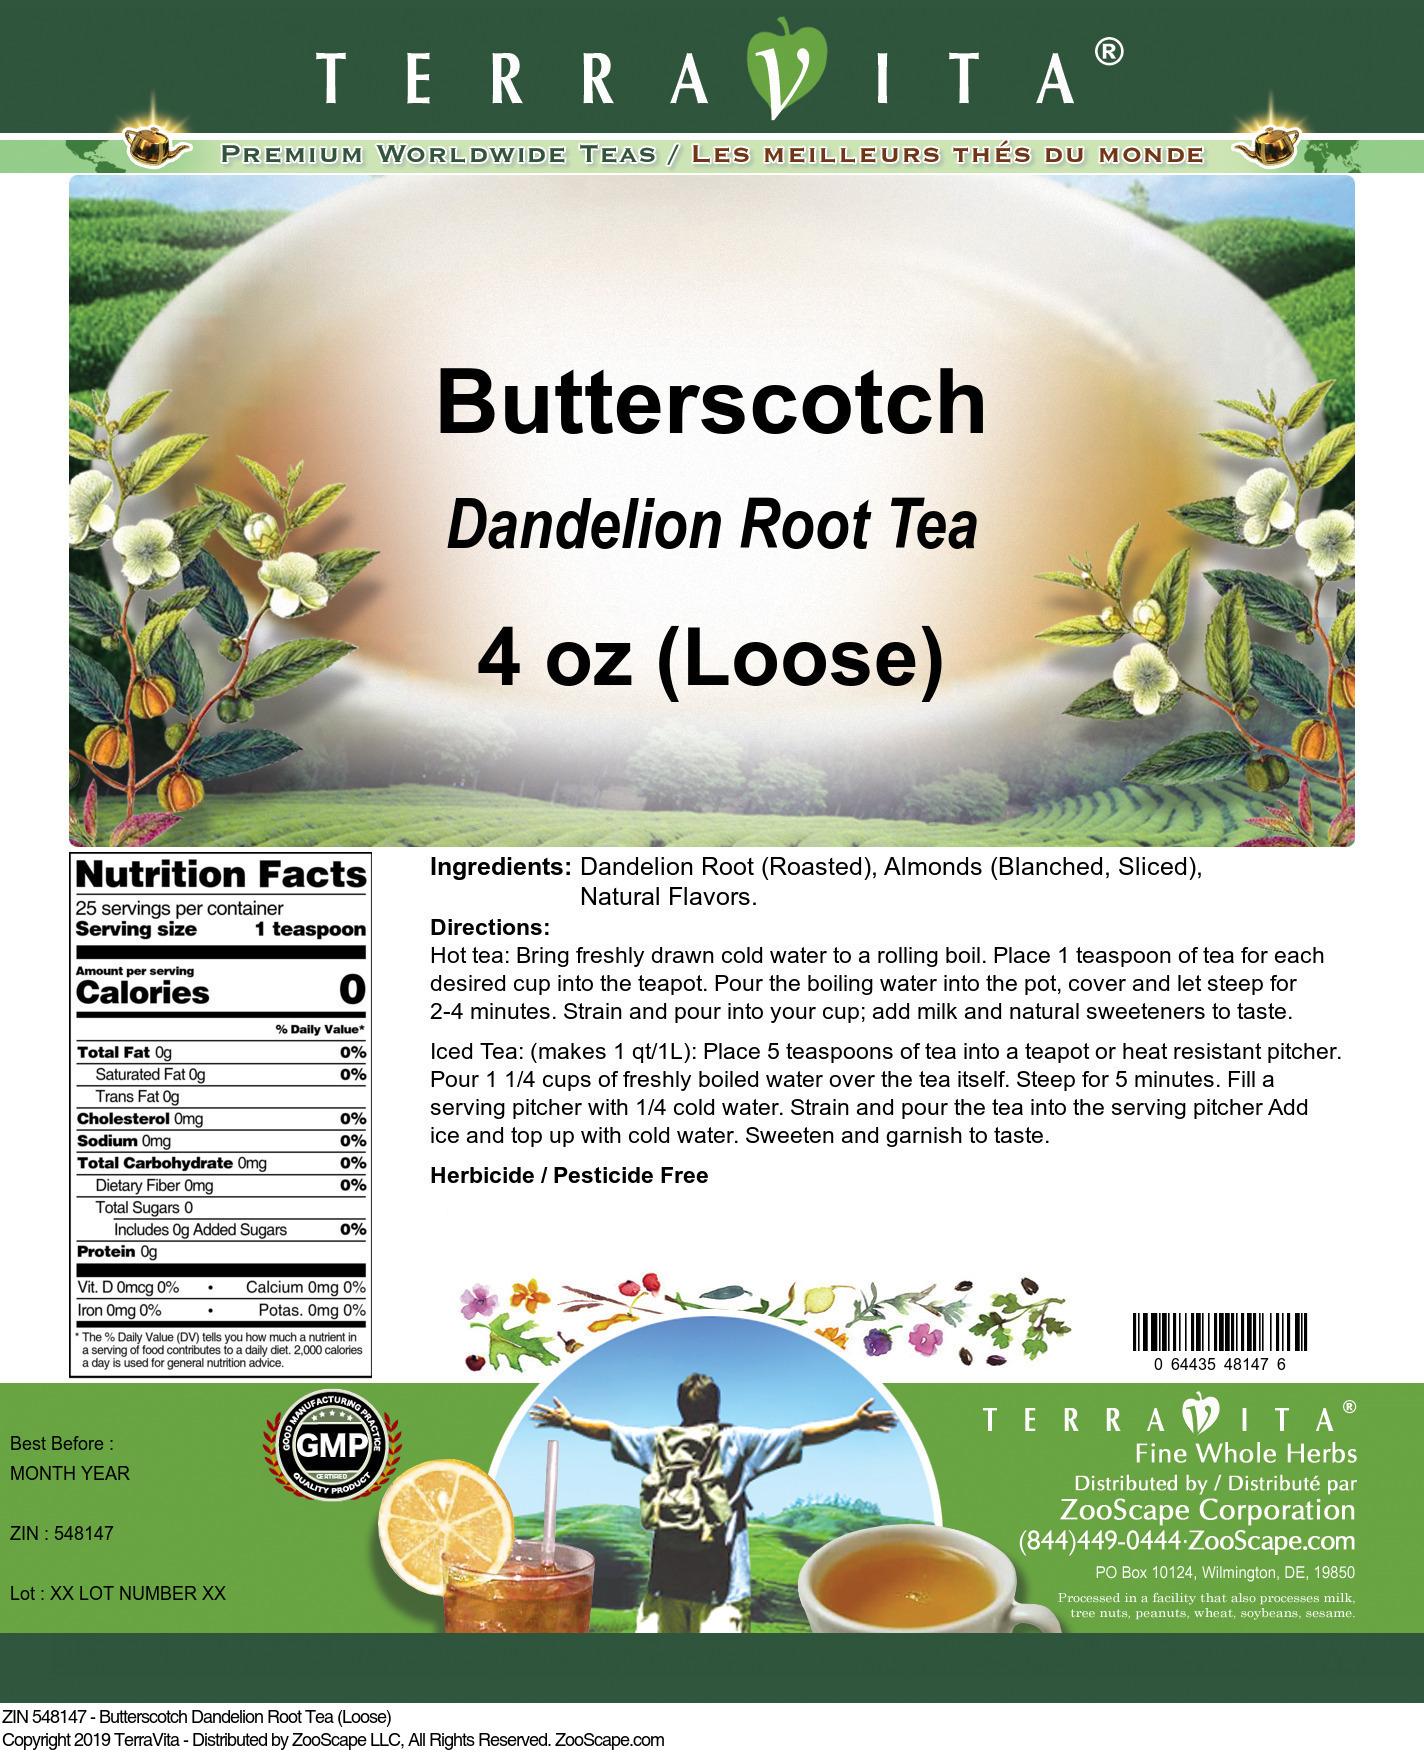 Butterscotch Dandelion Root